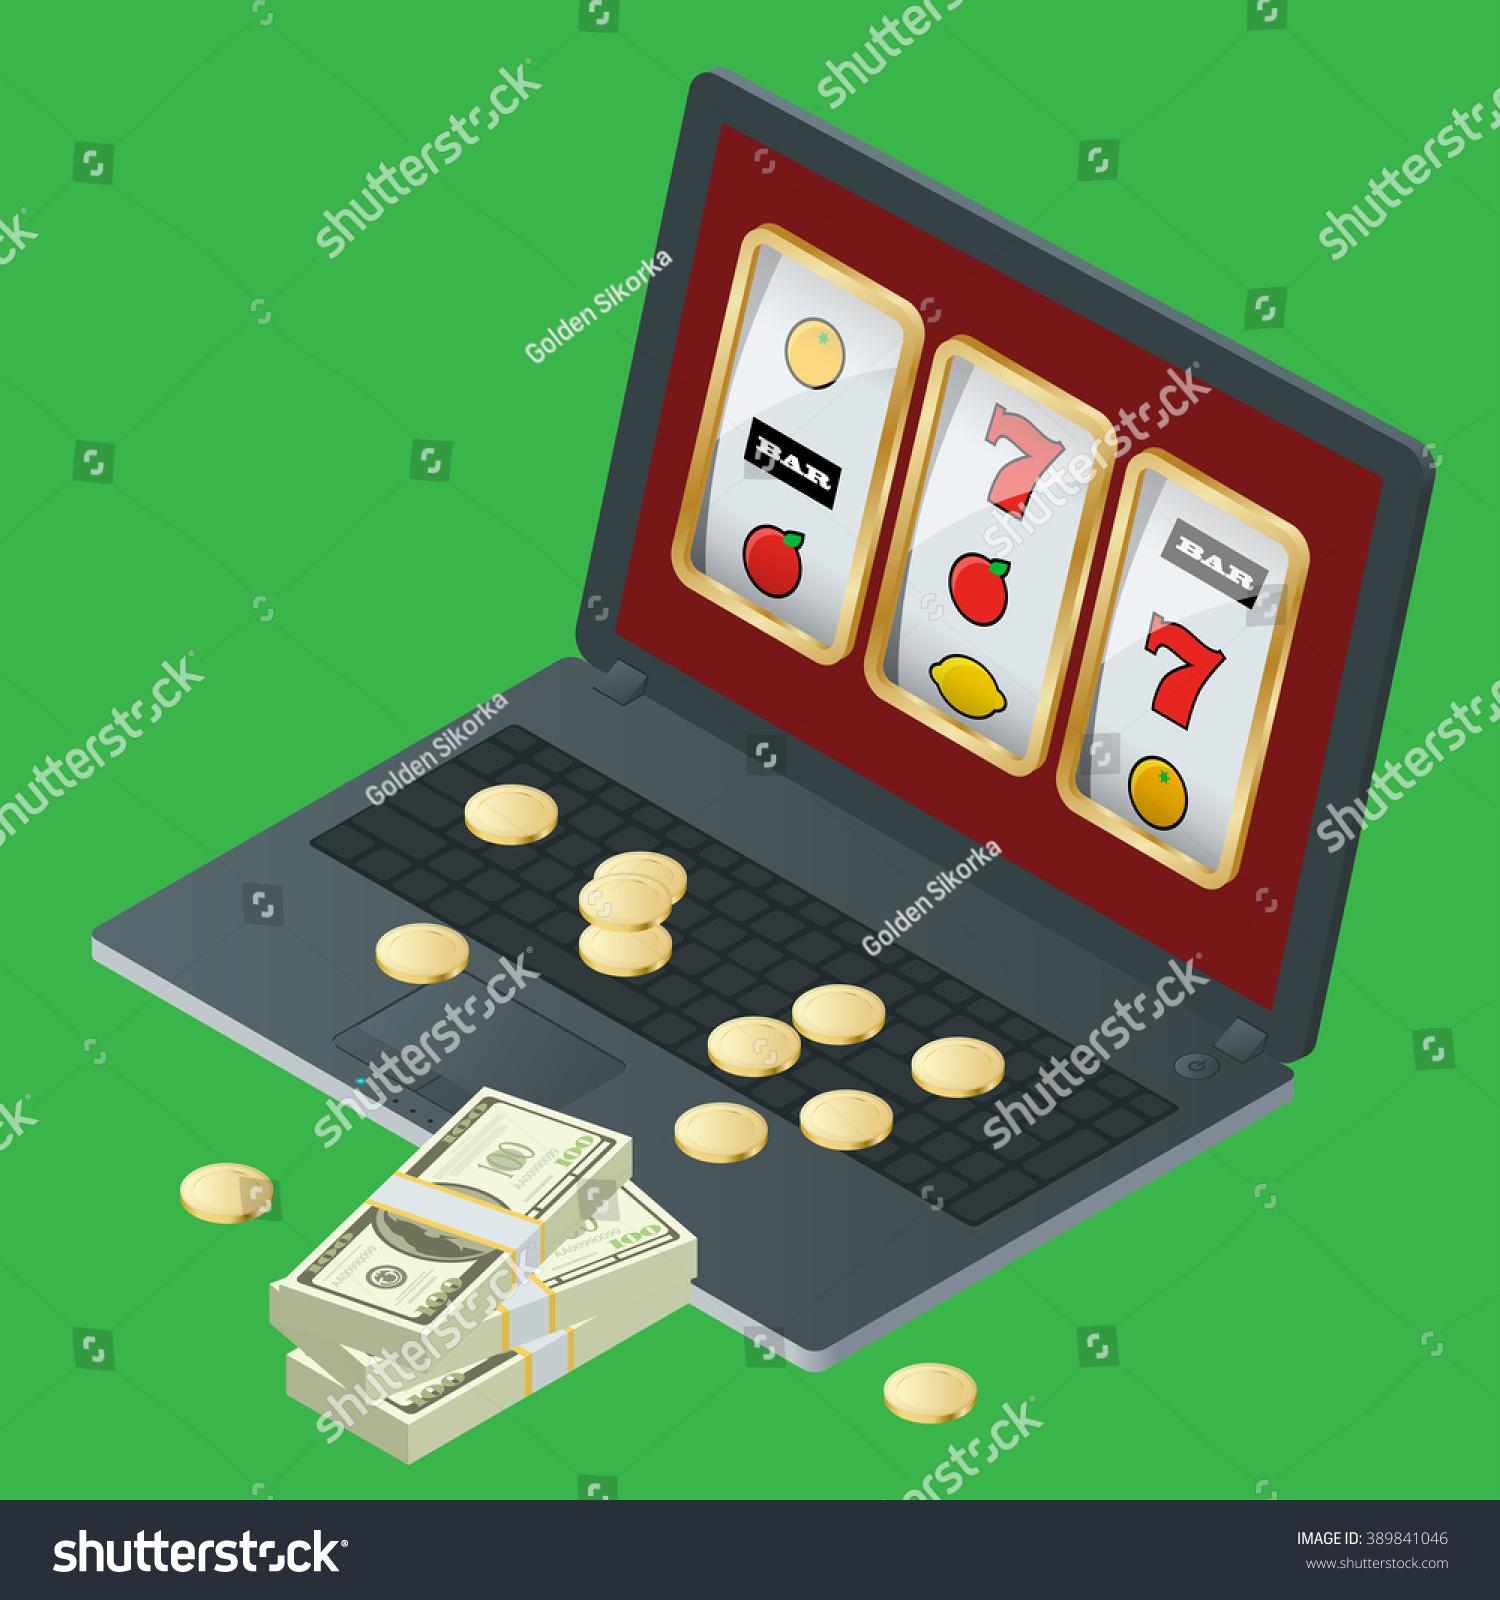 Genting casino queens square poker